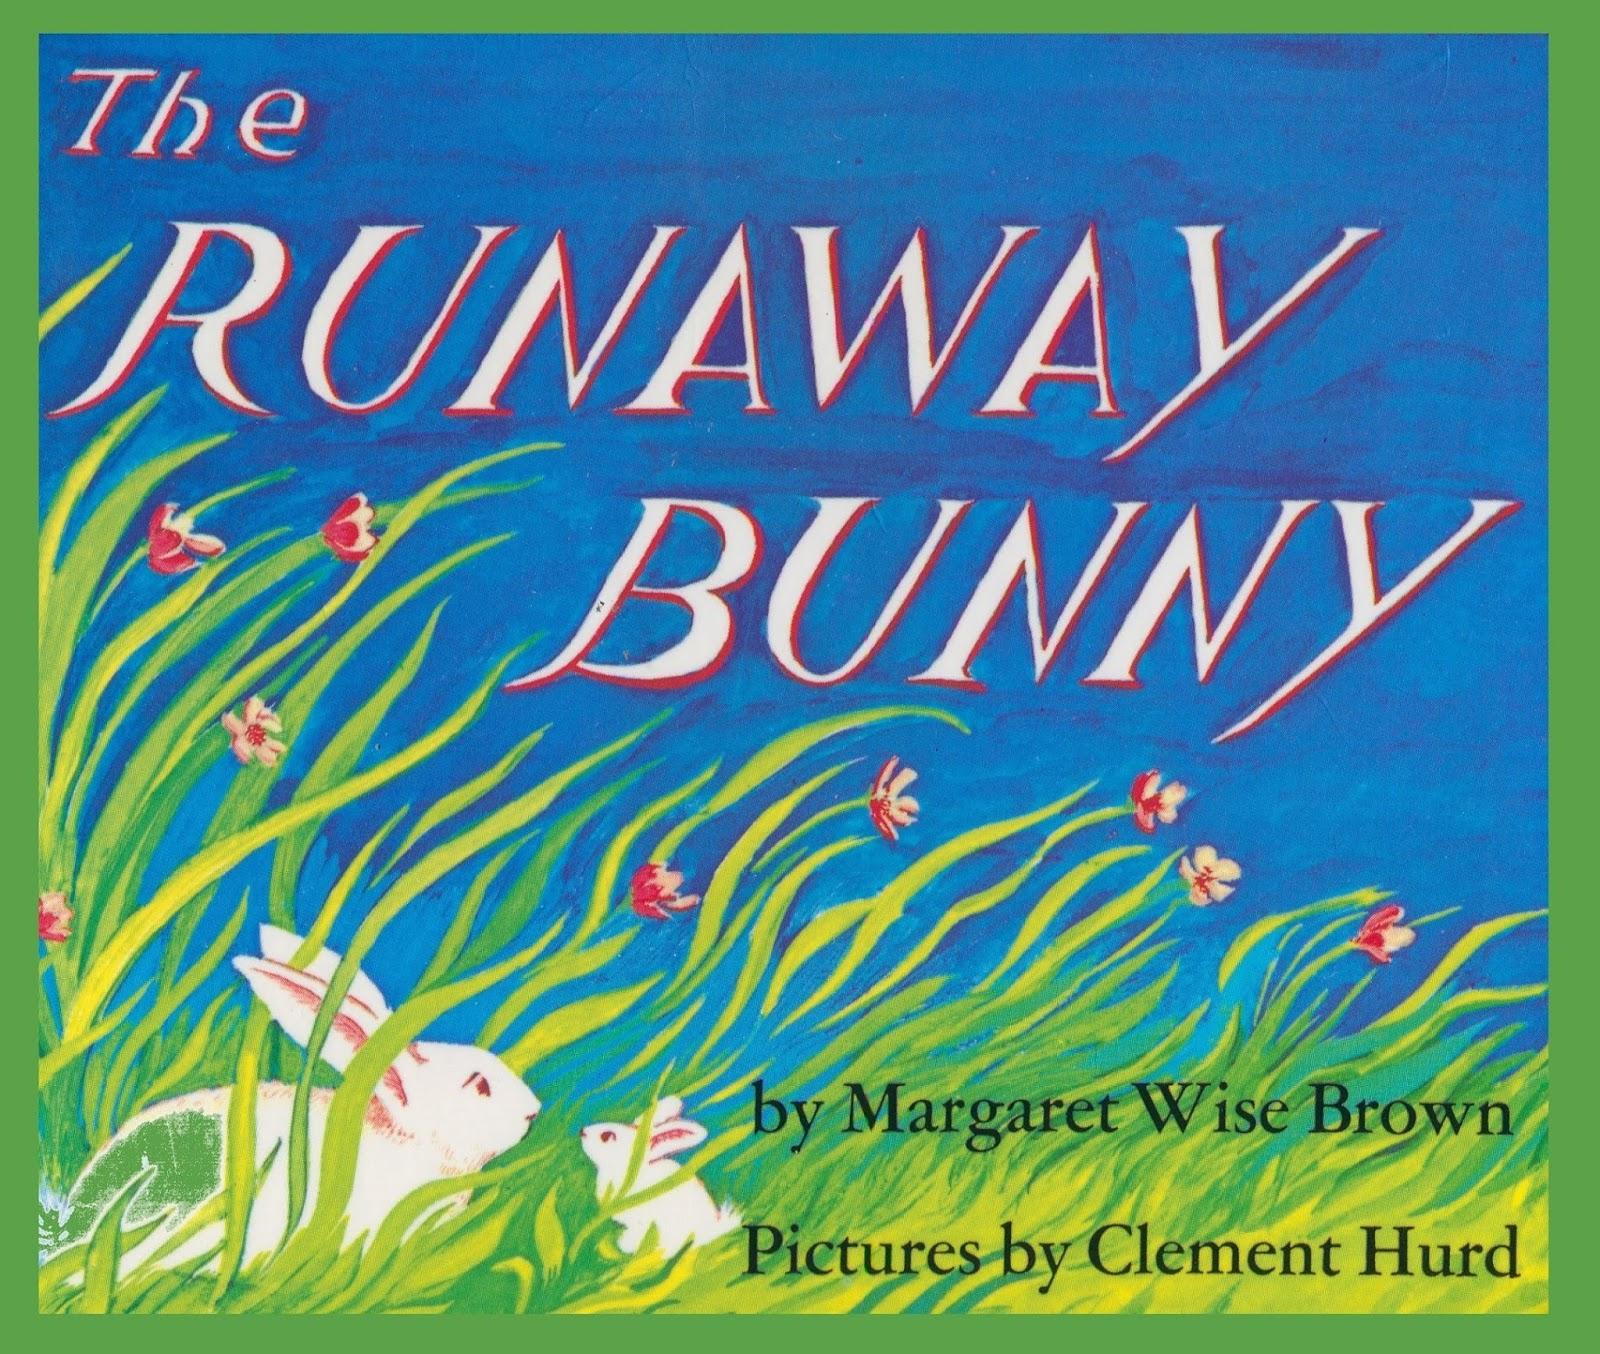 Stephanie Faris: My Favorite Children's Books